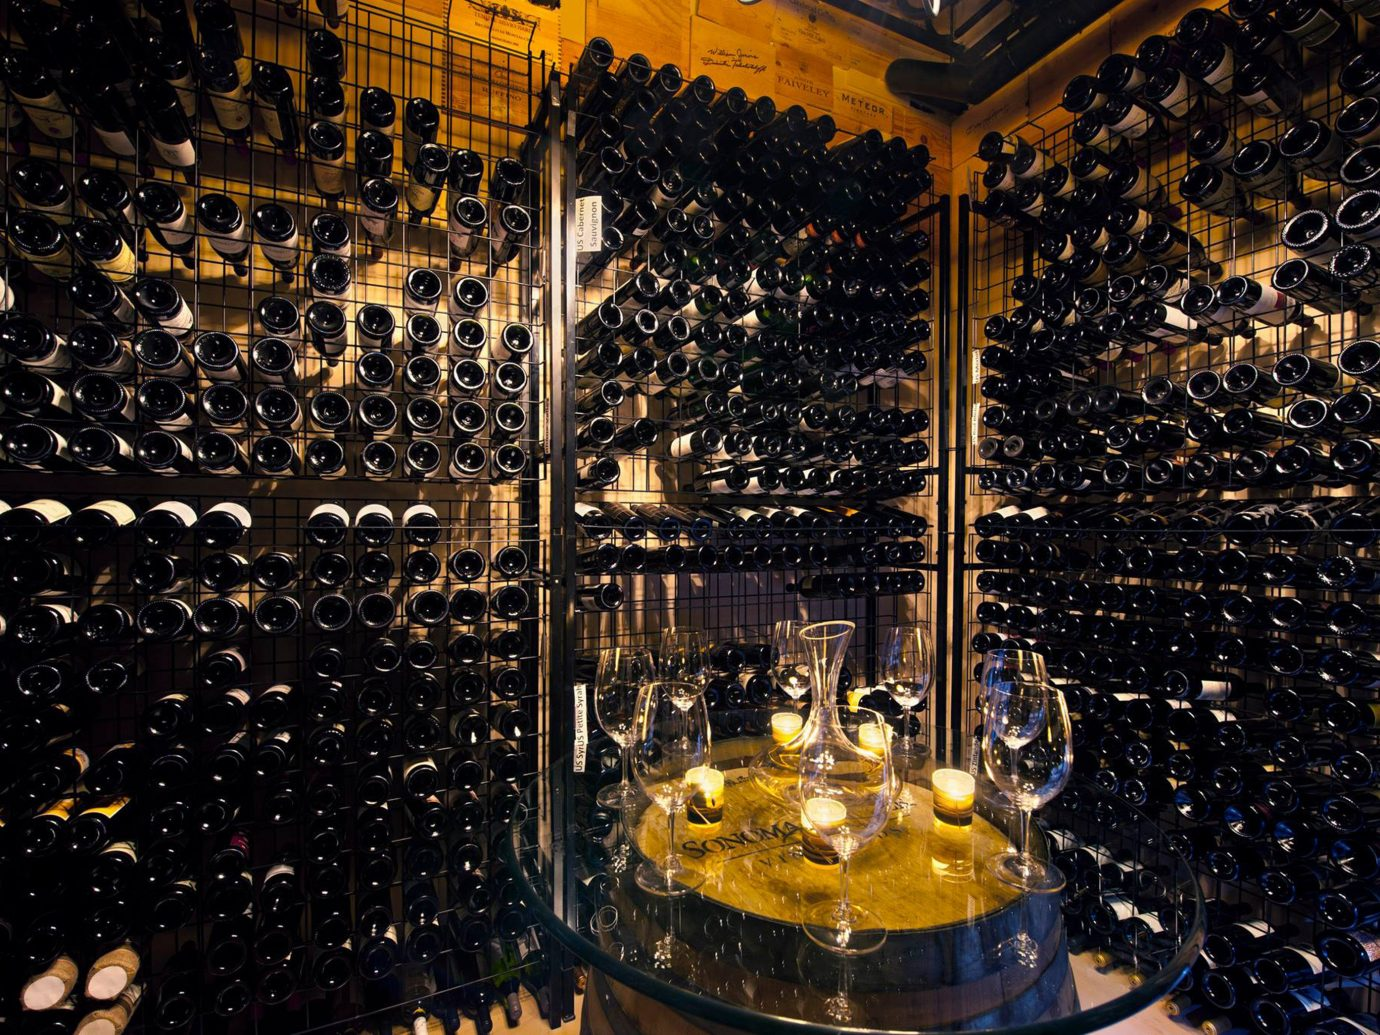 Bar Drink Elegant Jetsetter Guides Wine-Tasting indoor basement stage Winery lighting nightclub